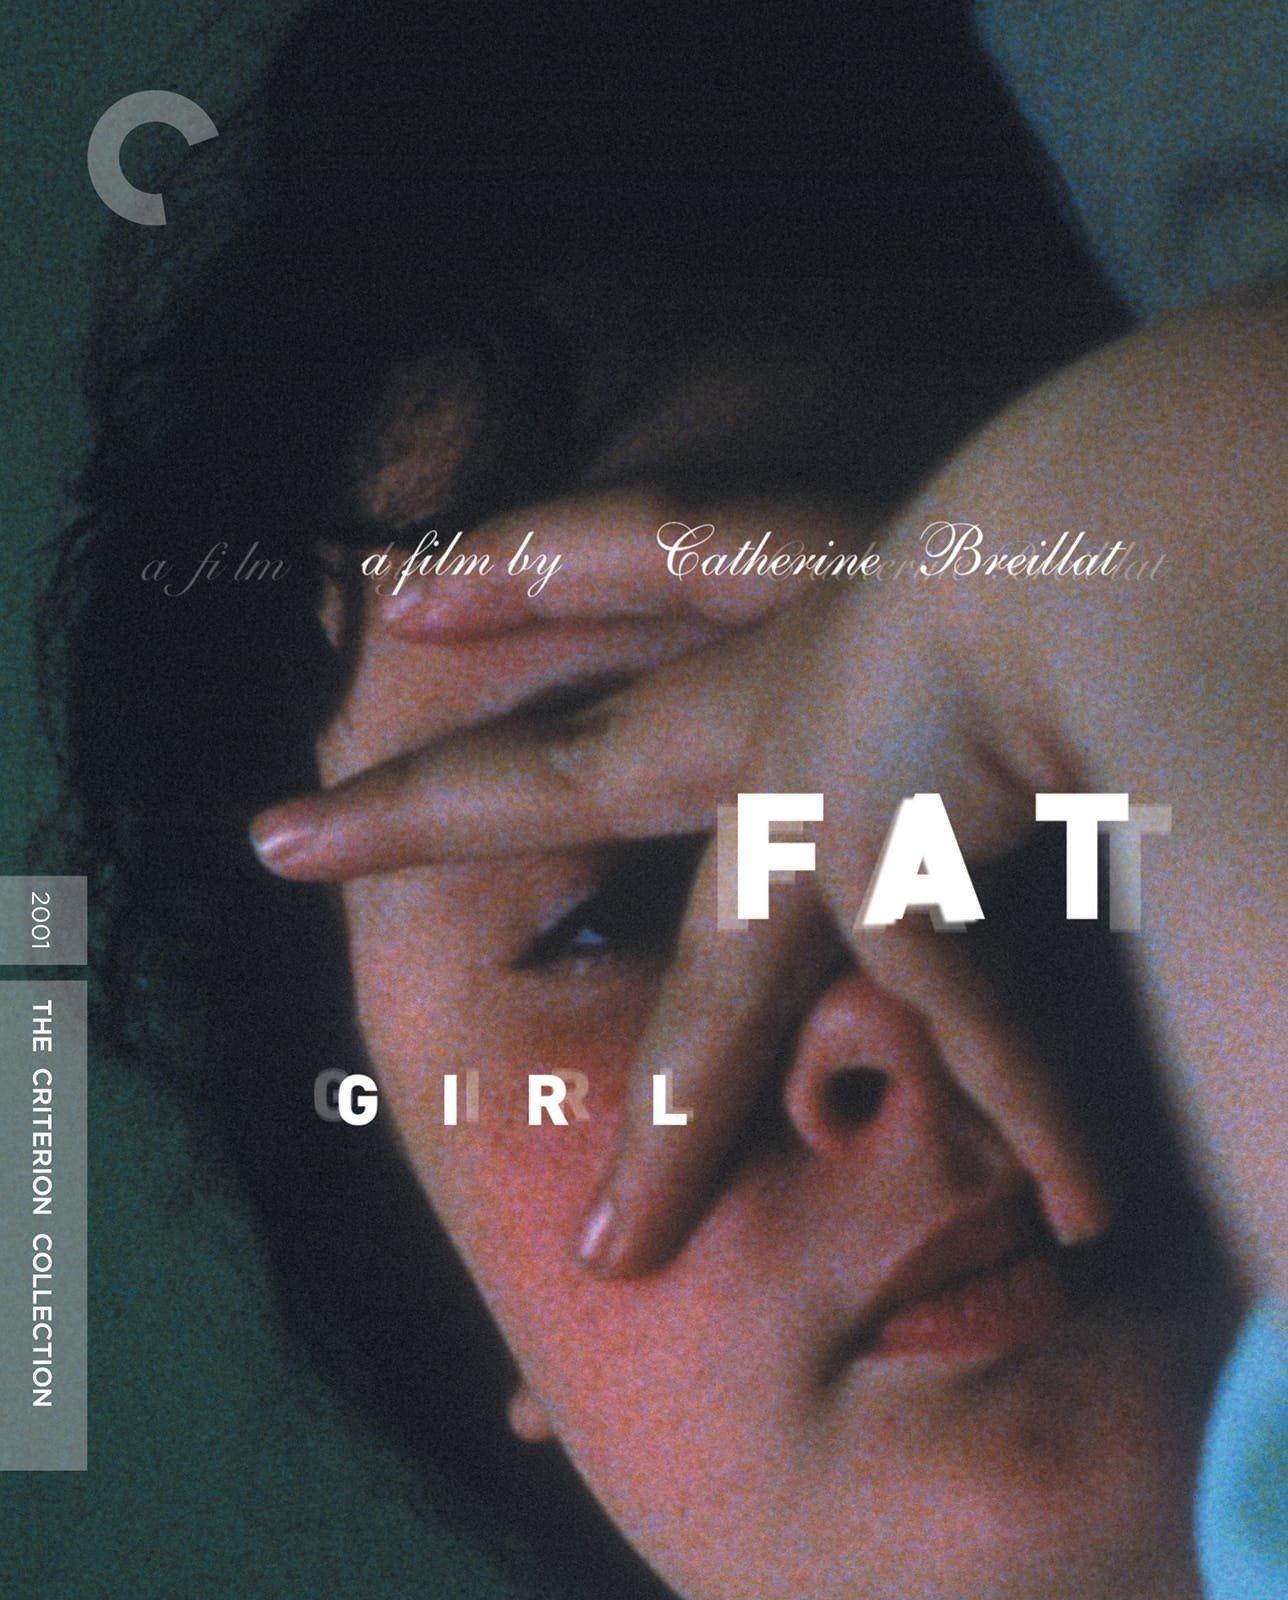 Anais Reboux Nude blu-ray review: fat girl - slant magazine